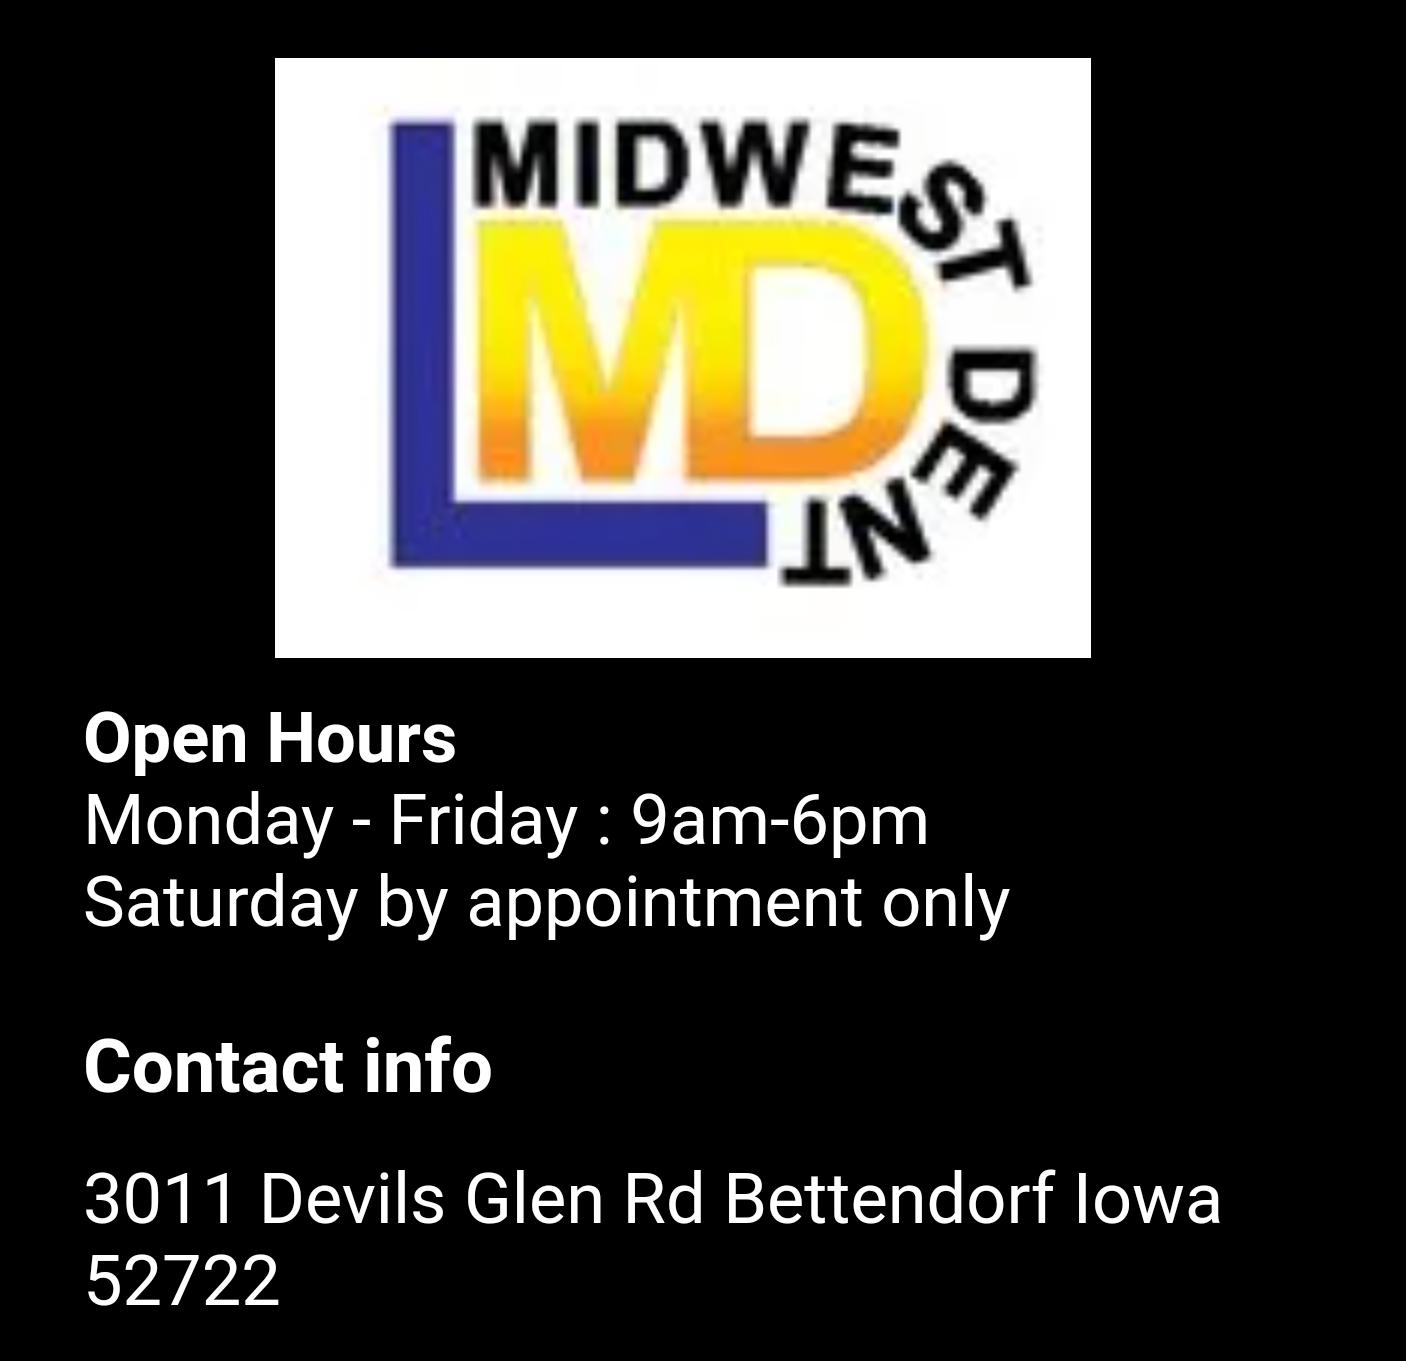 Midwest Dent logo